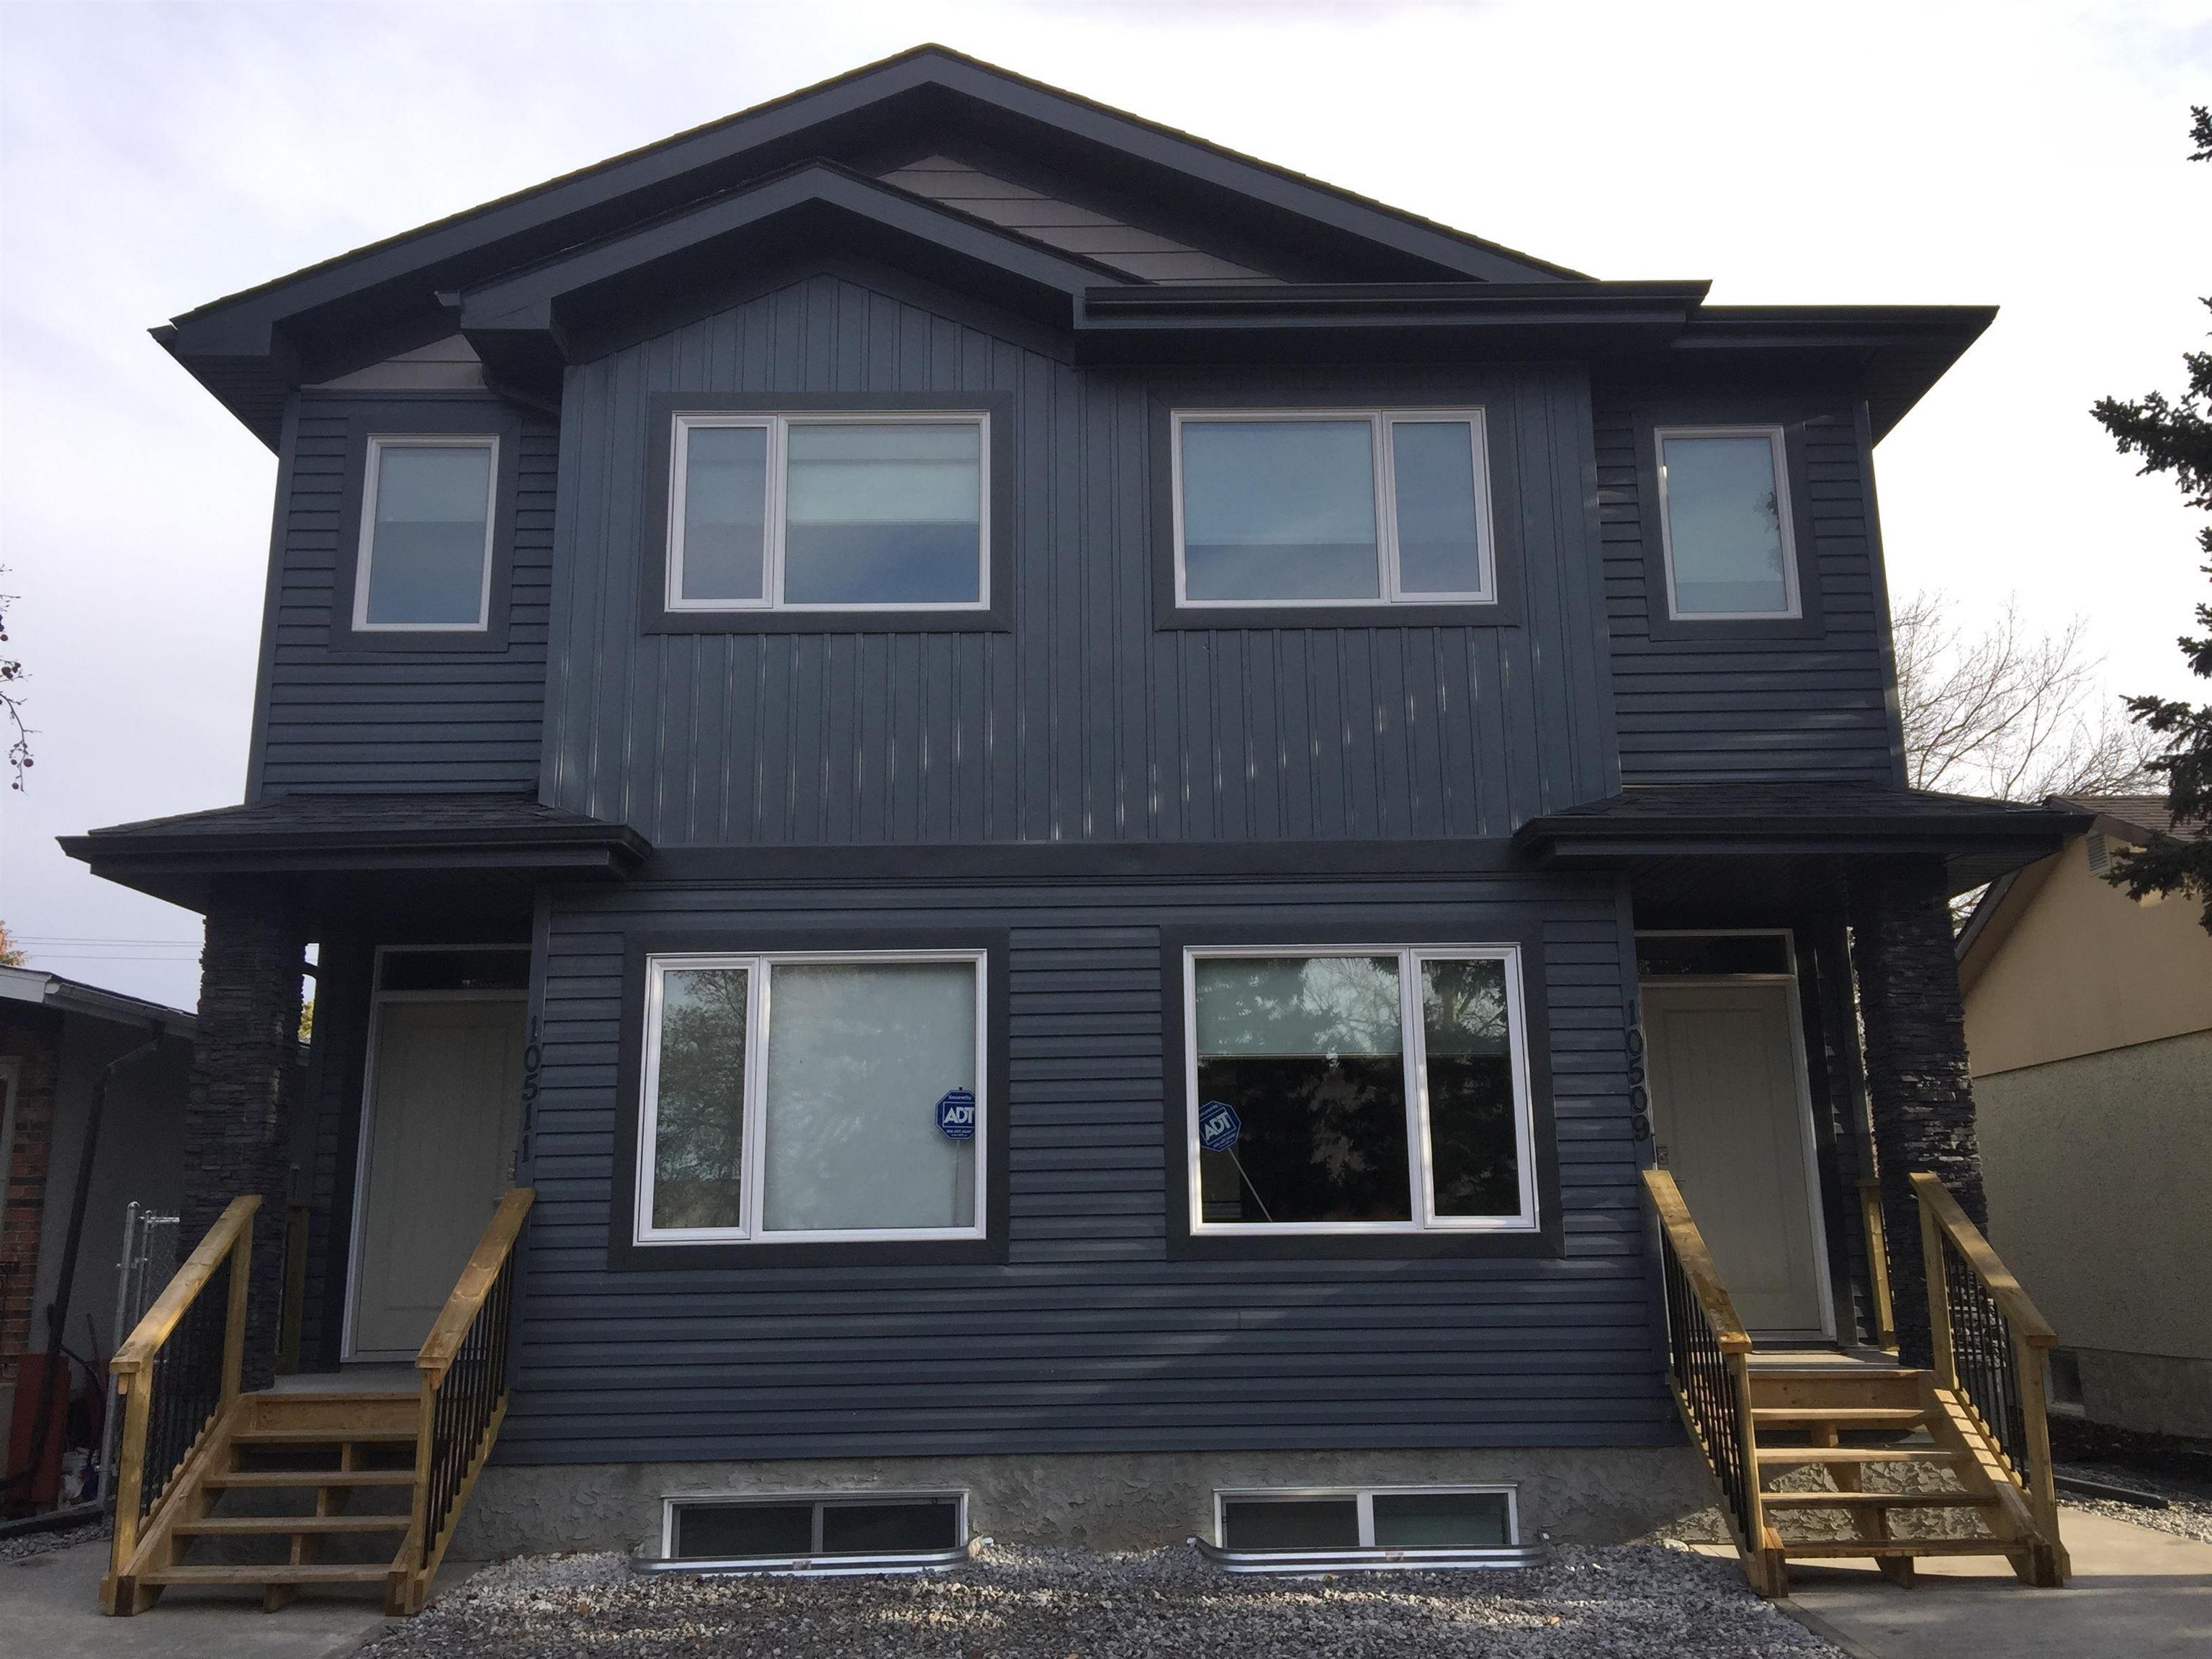 Main Photo: 10511 154 Street in Edmonton: Zone 21 House Half Duplex for sale : MLS®# E4266351